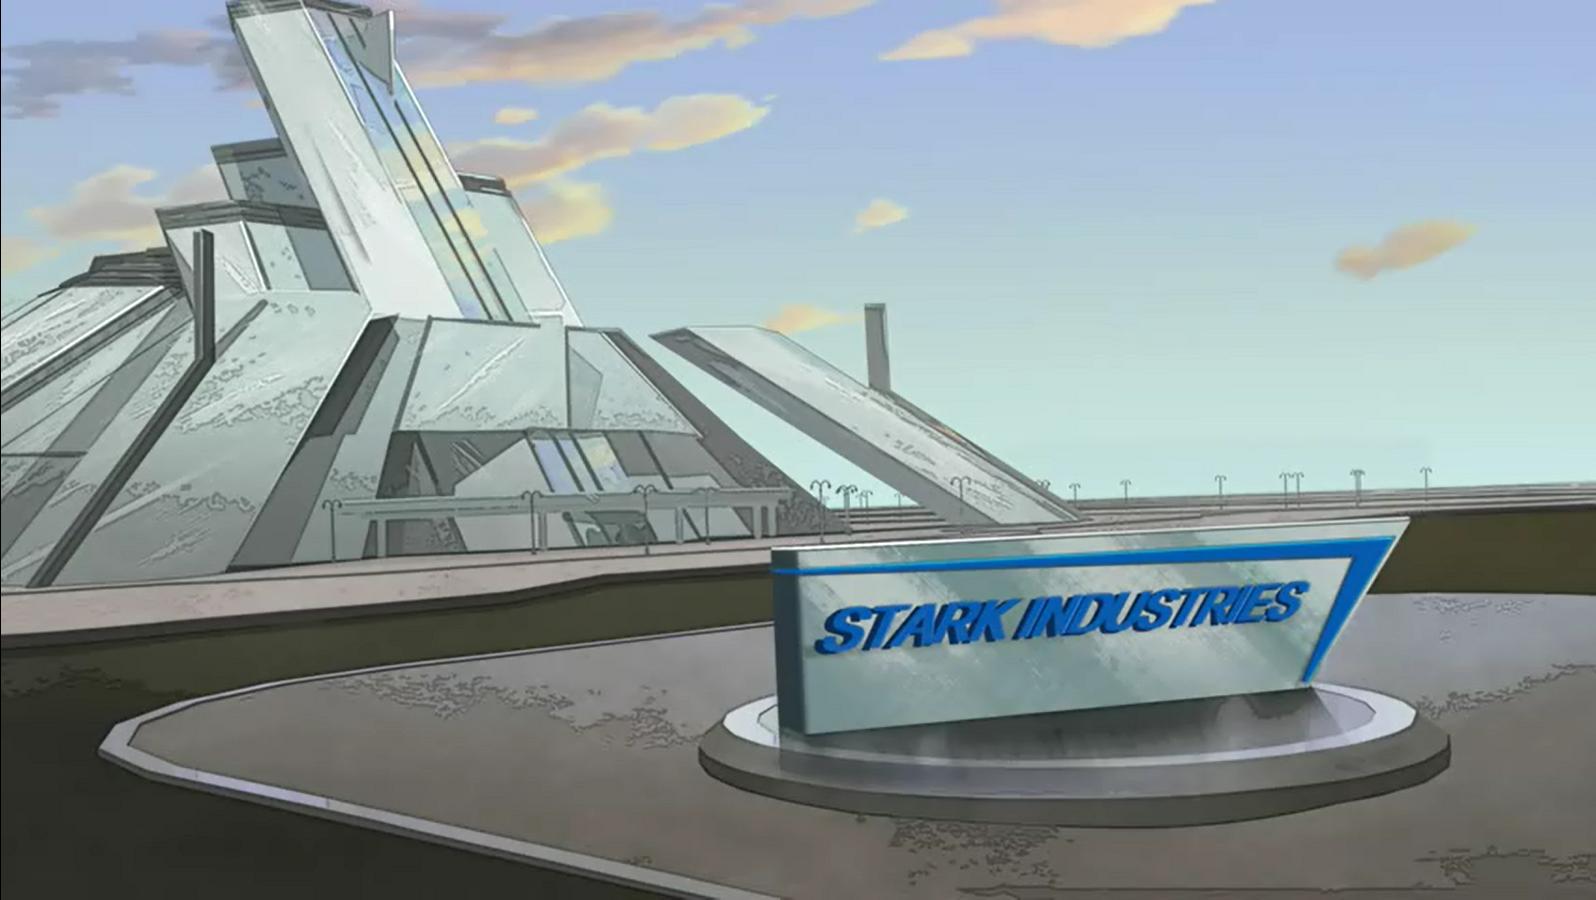 Stark Industries pngStark Industries Png